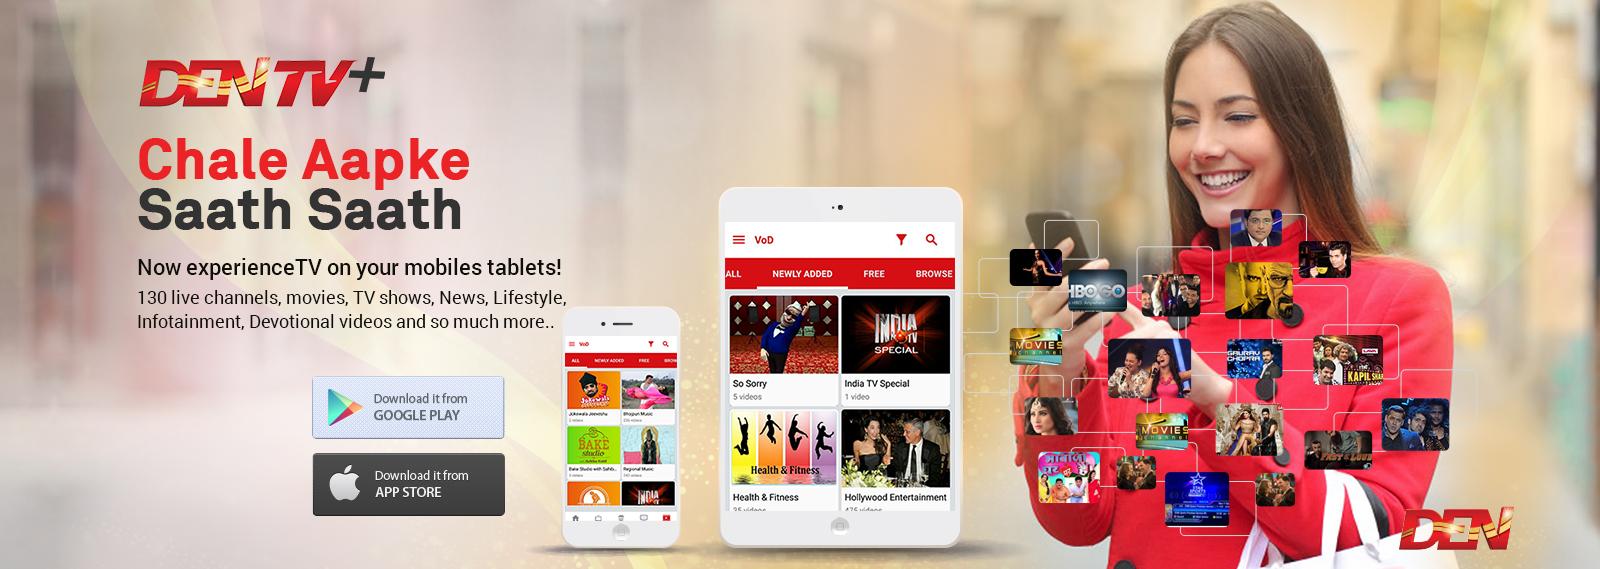 DEN Cricket Watch Live TV - digital cable network